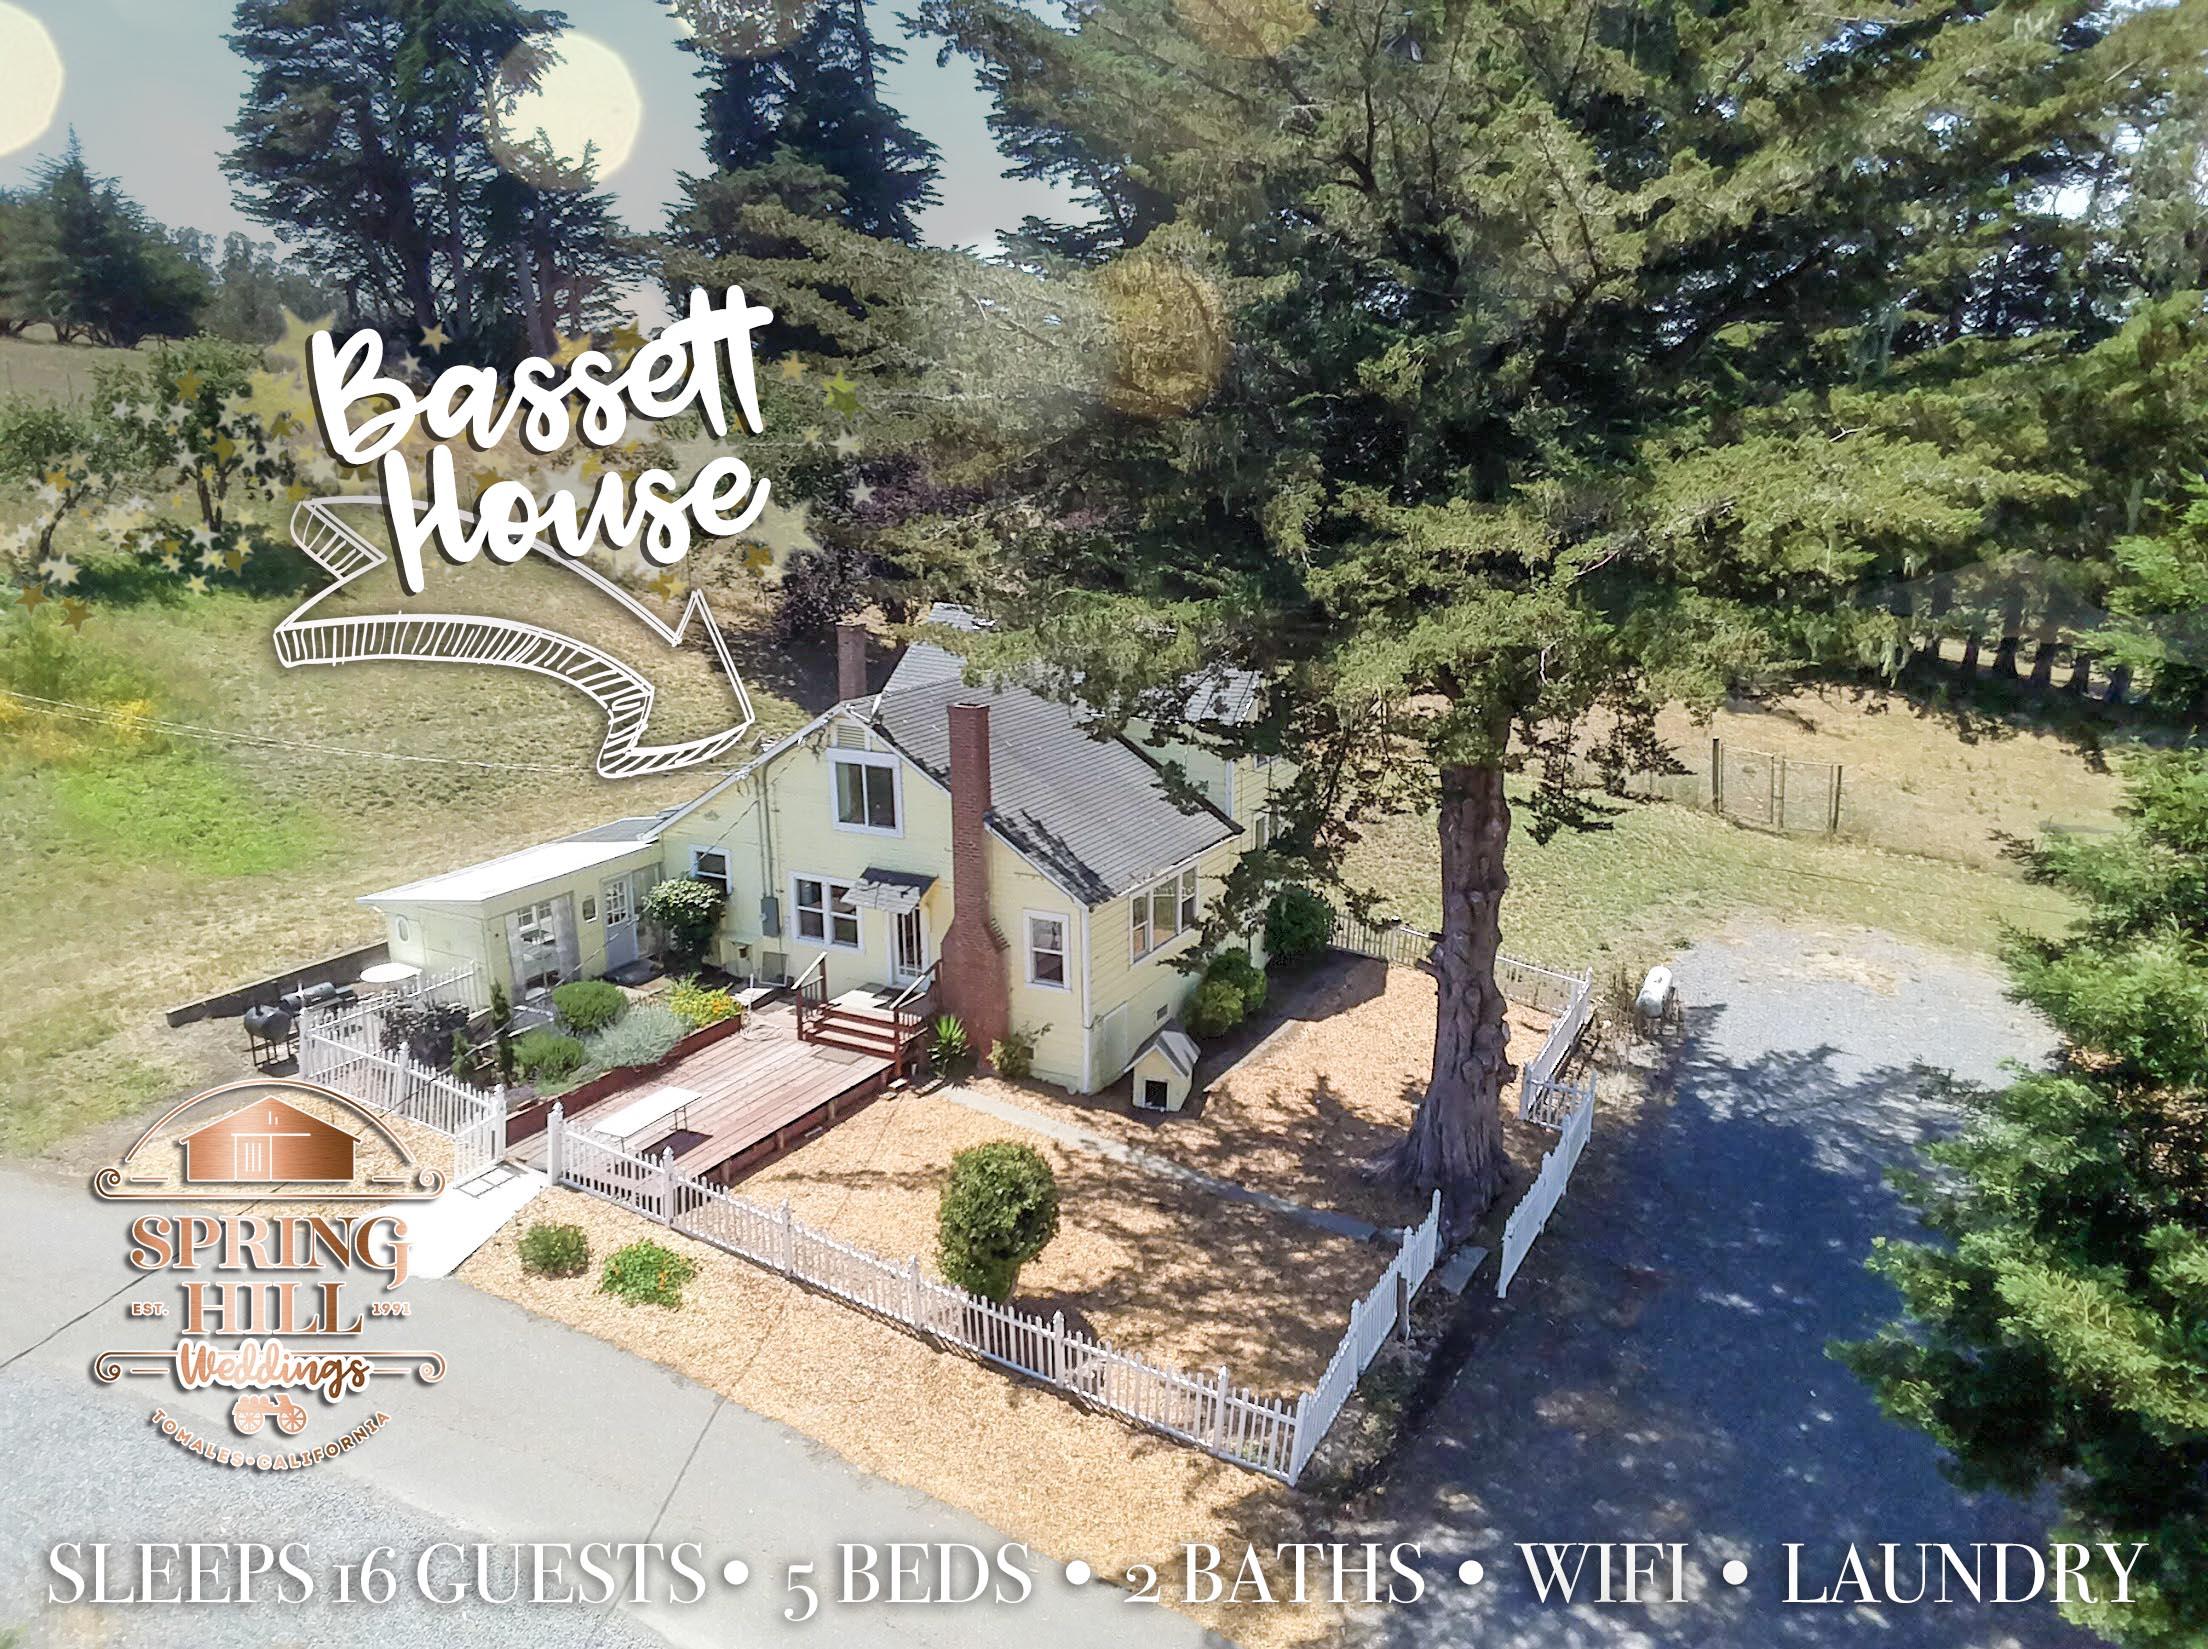 barnyard_Propertie_rental_house_wedding_country_farm_petaluma_bodega_Bay_tomales_CA_94975_94953_San_fran copy.jpg